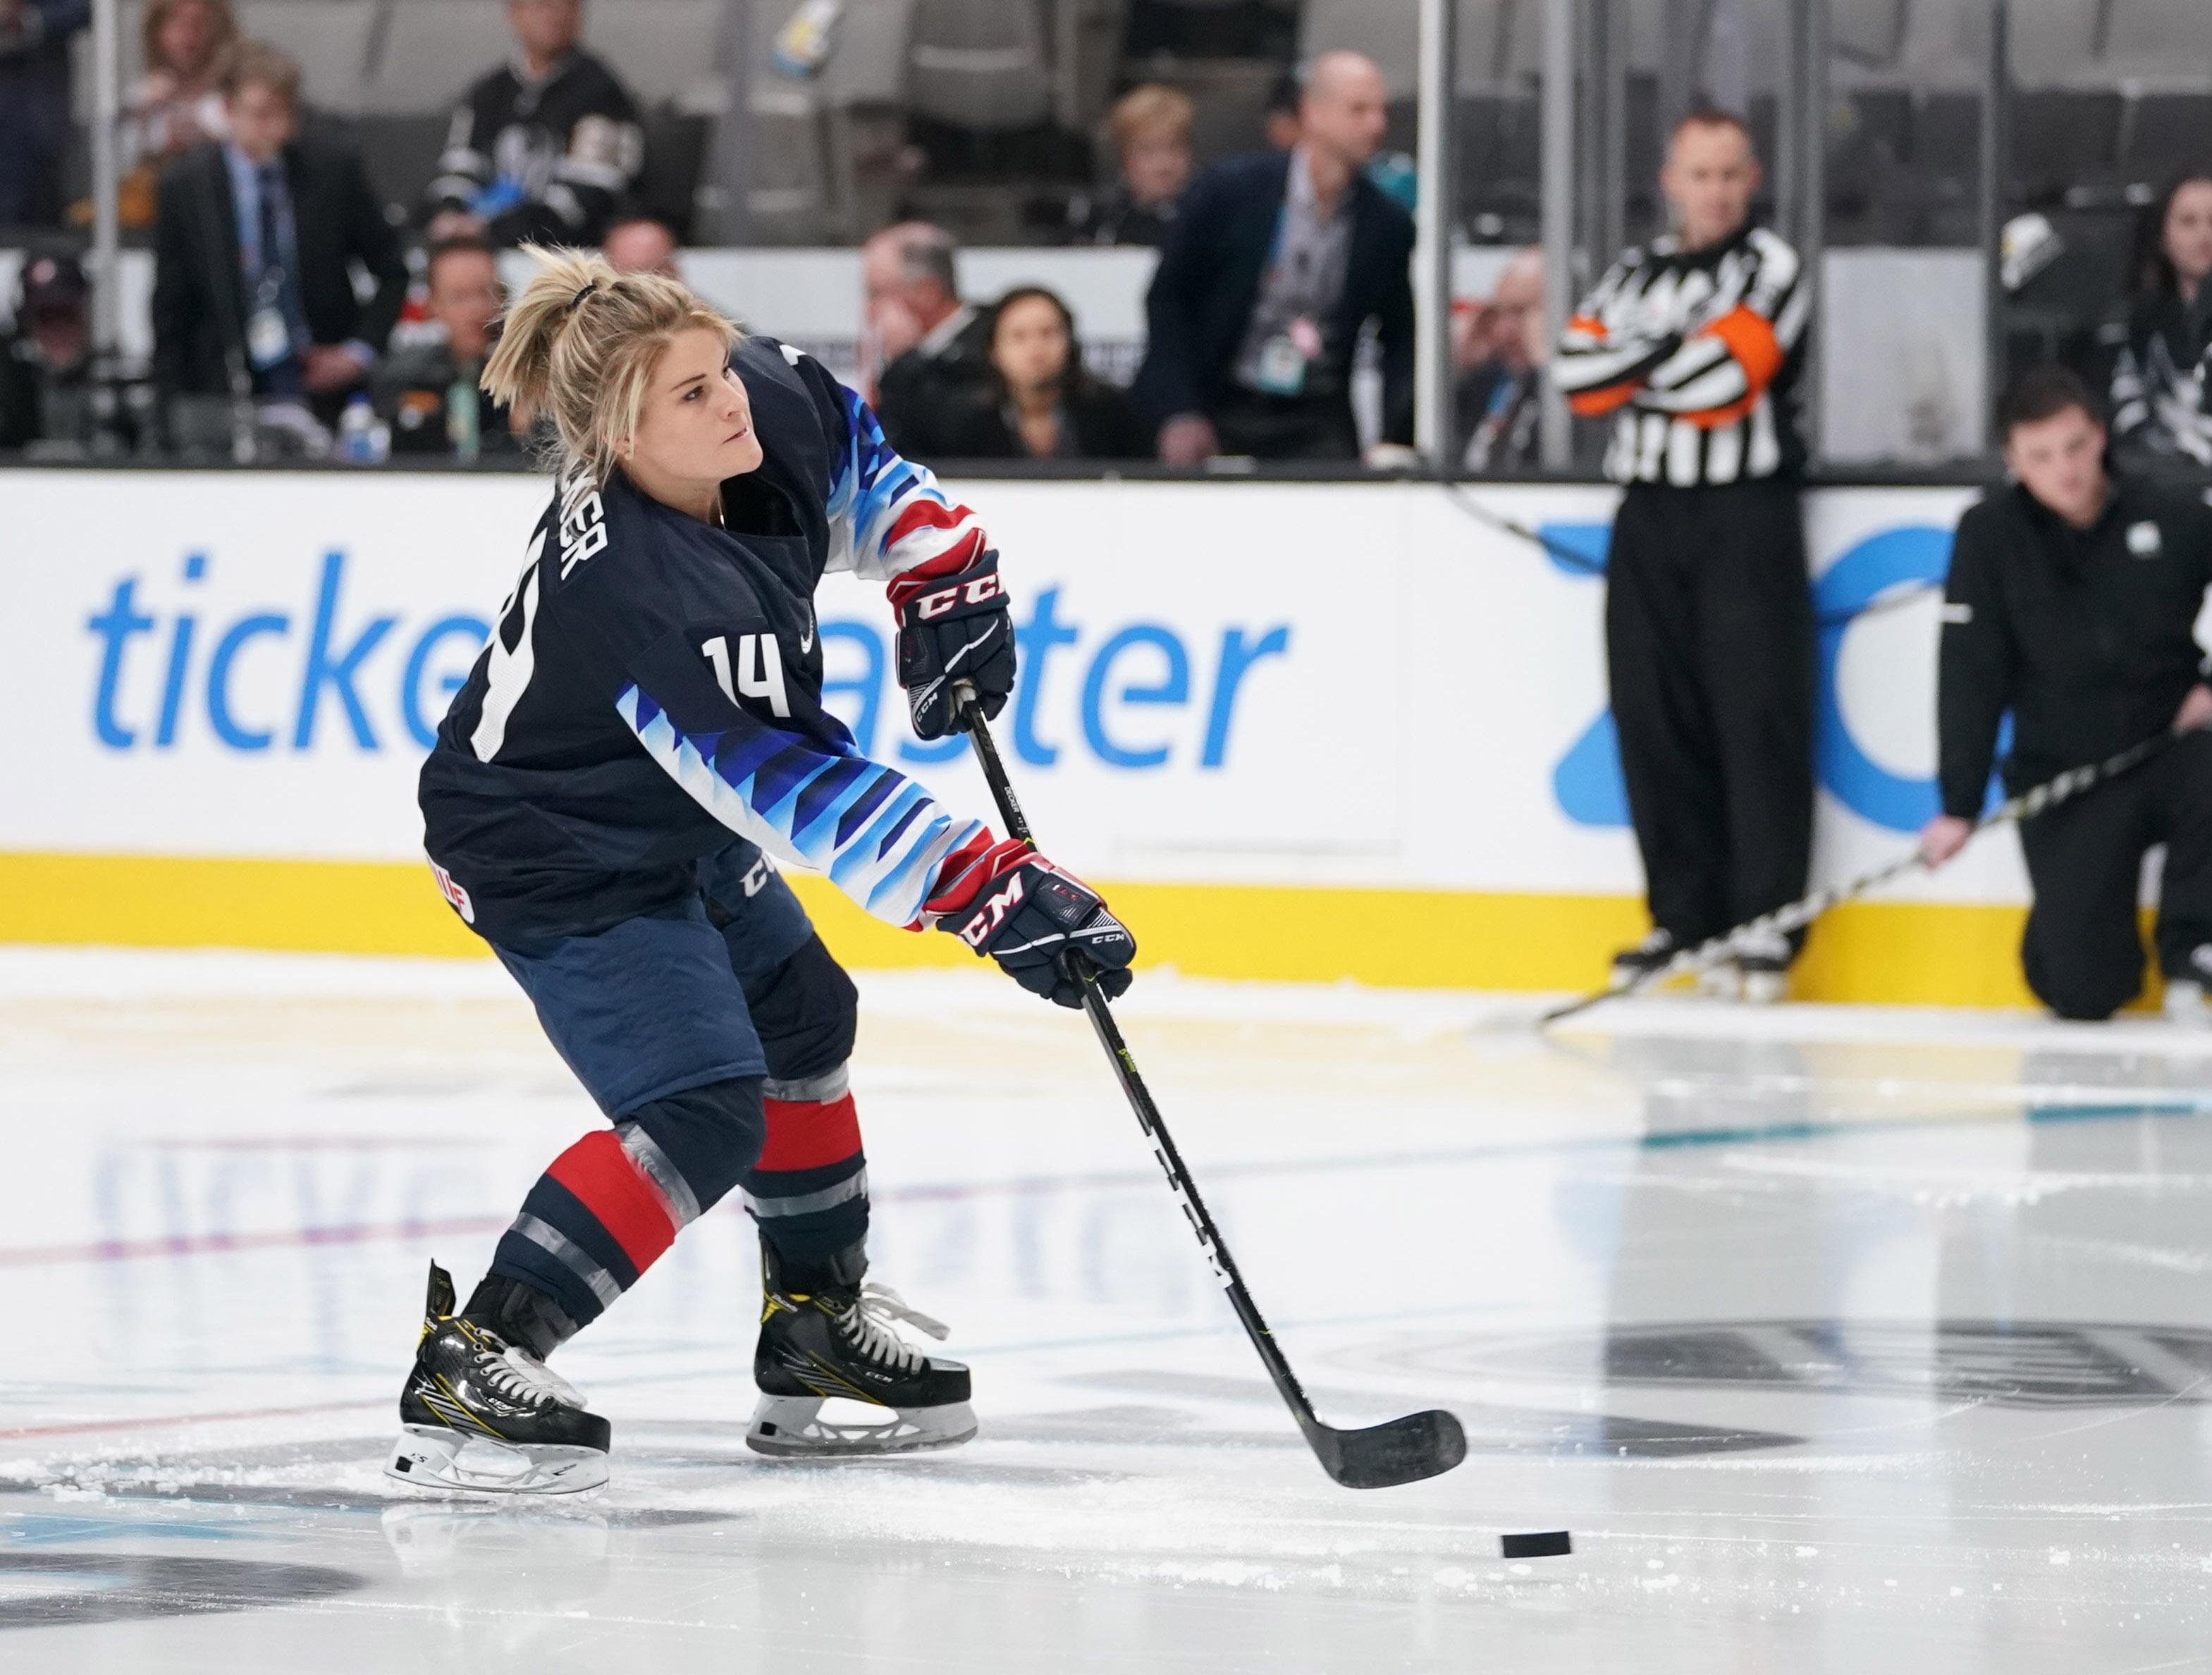 NHL Misses Golden PR Opportunity After Brianna Decker's Performance